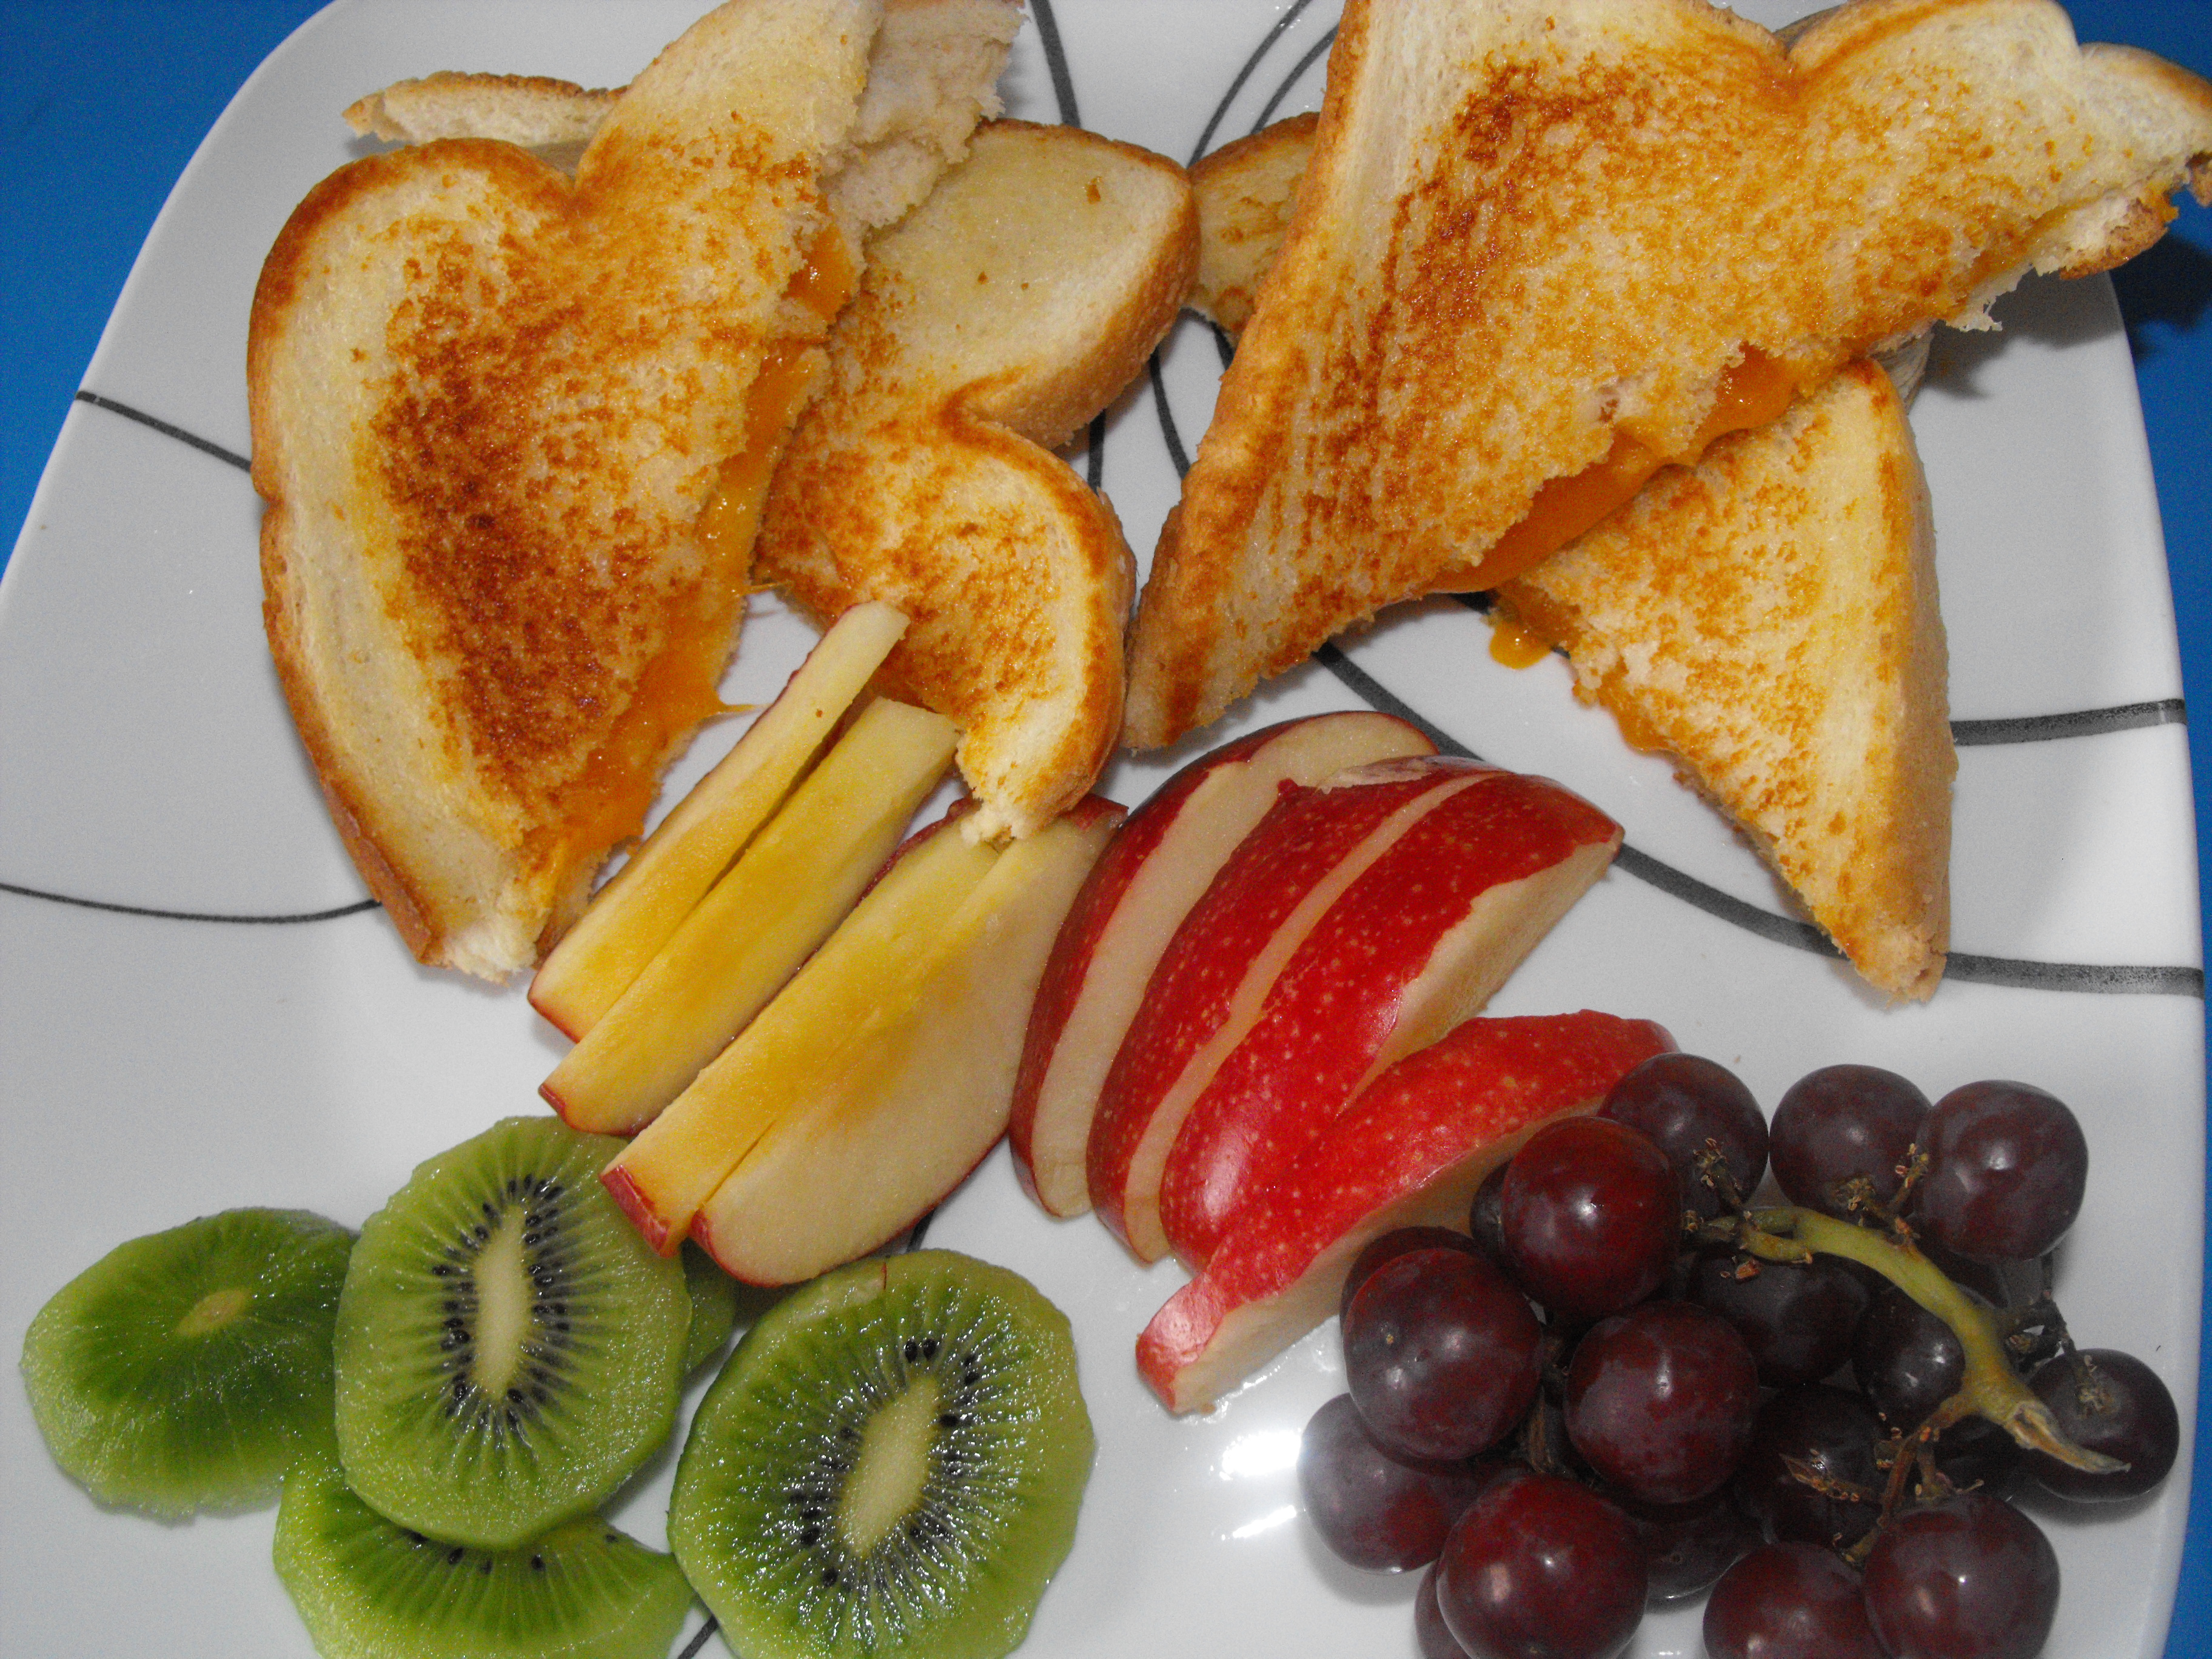 http://foodloader.net/cutie_2010-01-03_Grilled_Cheese_Sandwich.jpg